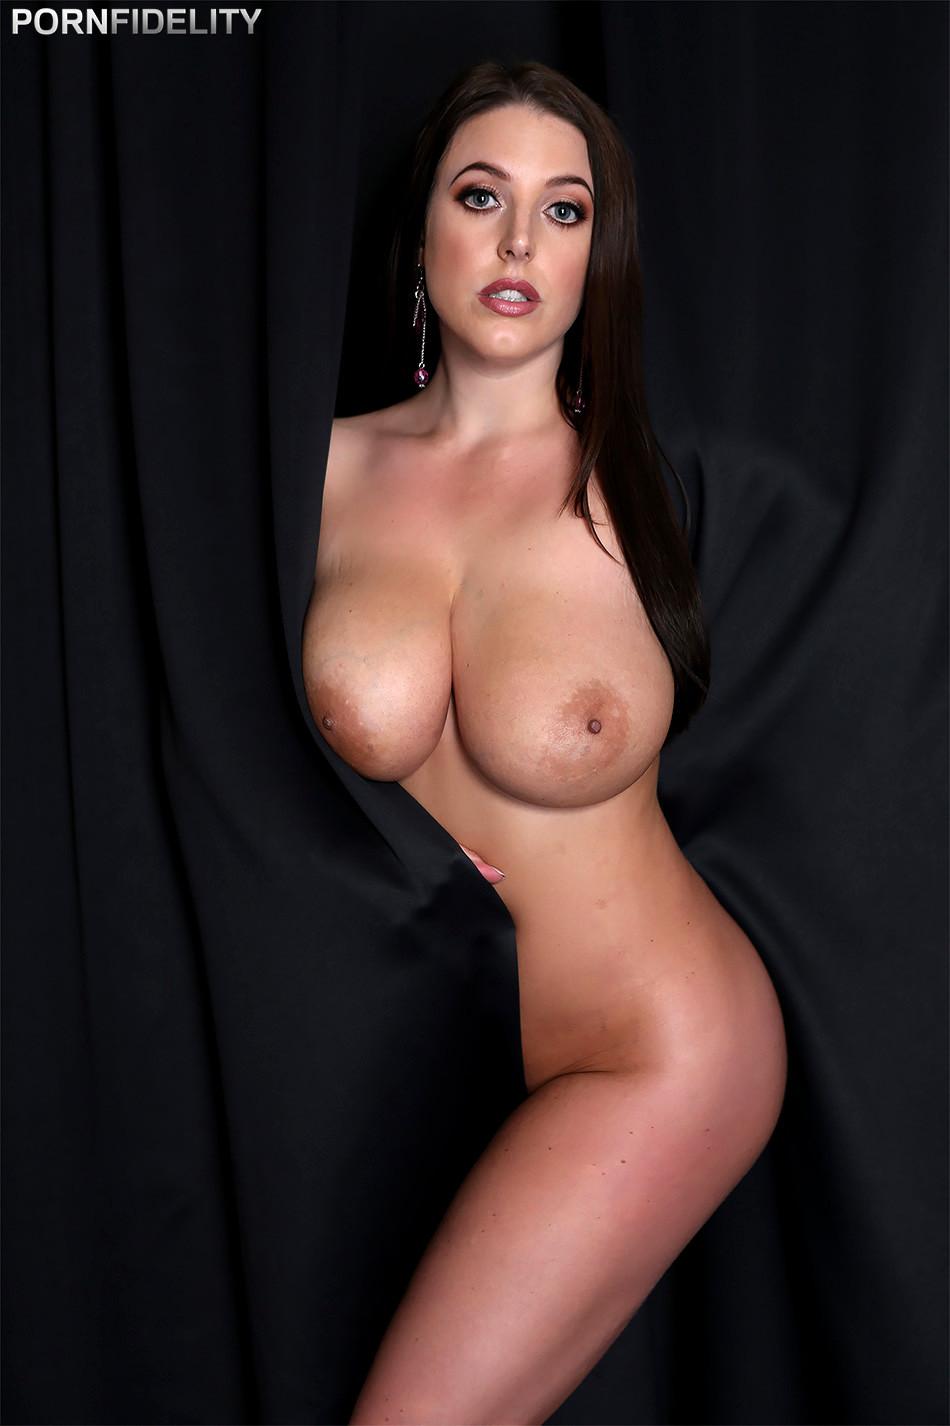 Milf Porno Fotogalleri